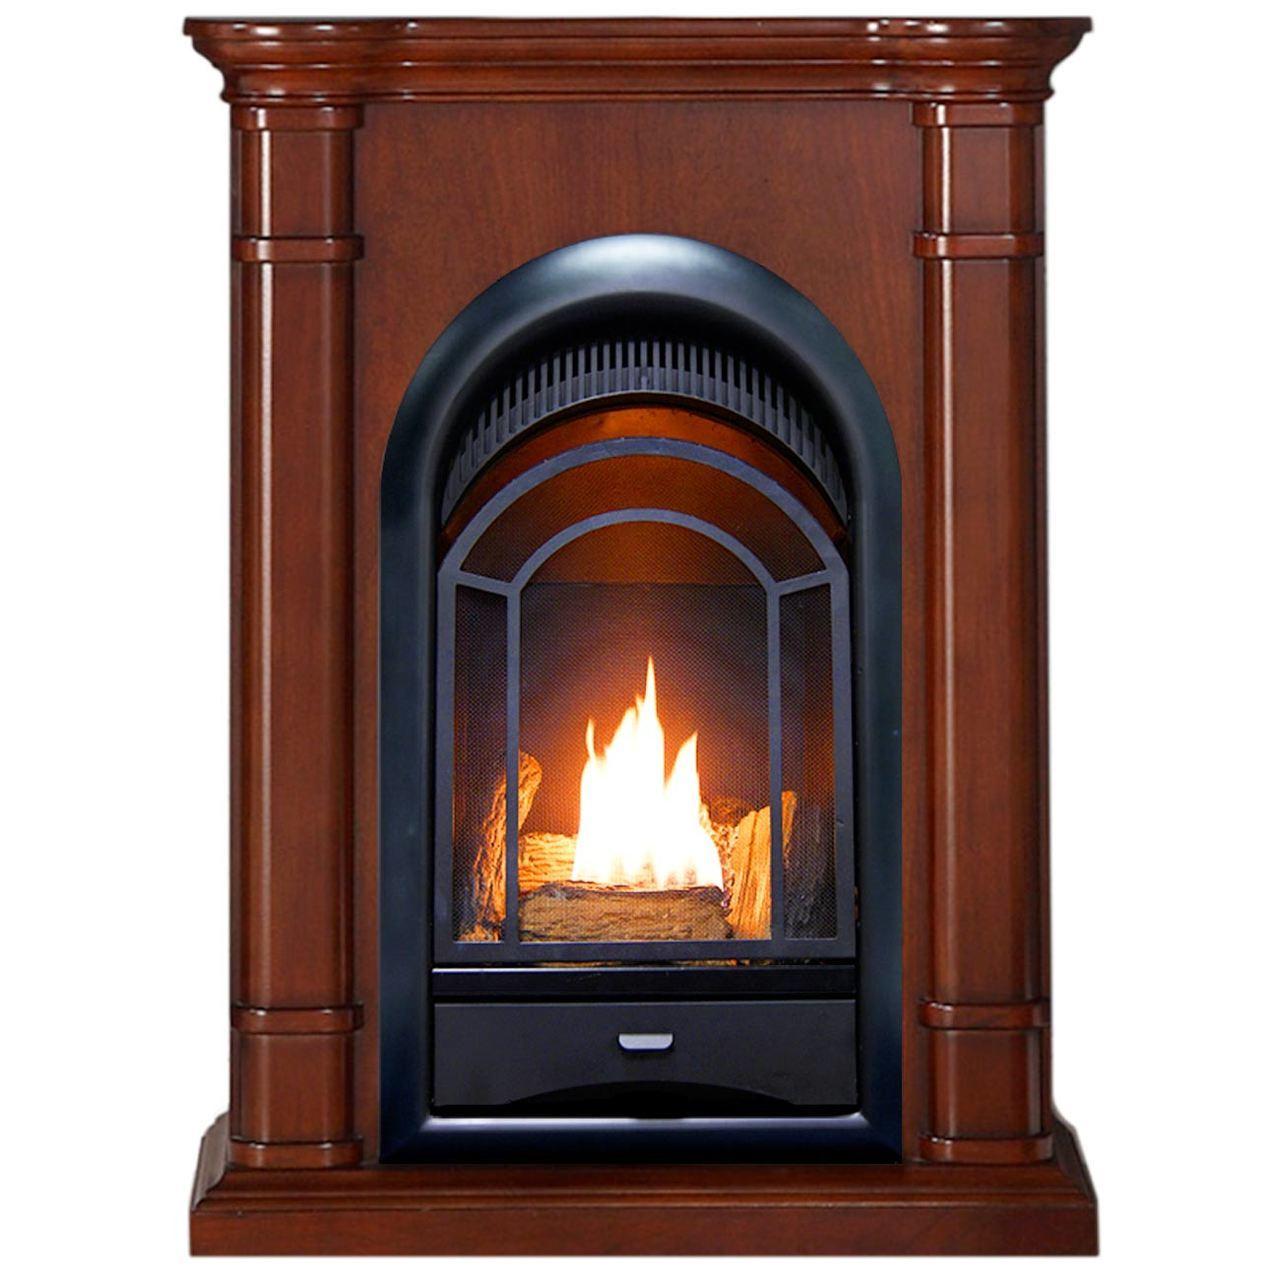 10000 Btu Electric Fireplace Inspirational Pro Fs100t 3w Ventless Fireplace System 10k Btu Duel Fuel thermostat Insert and Walnut Mantel